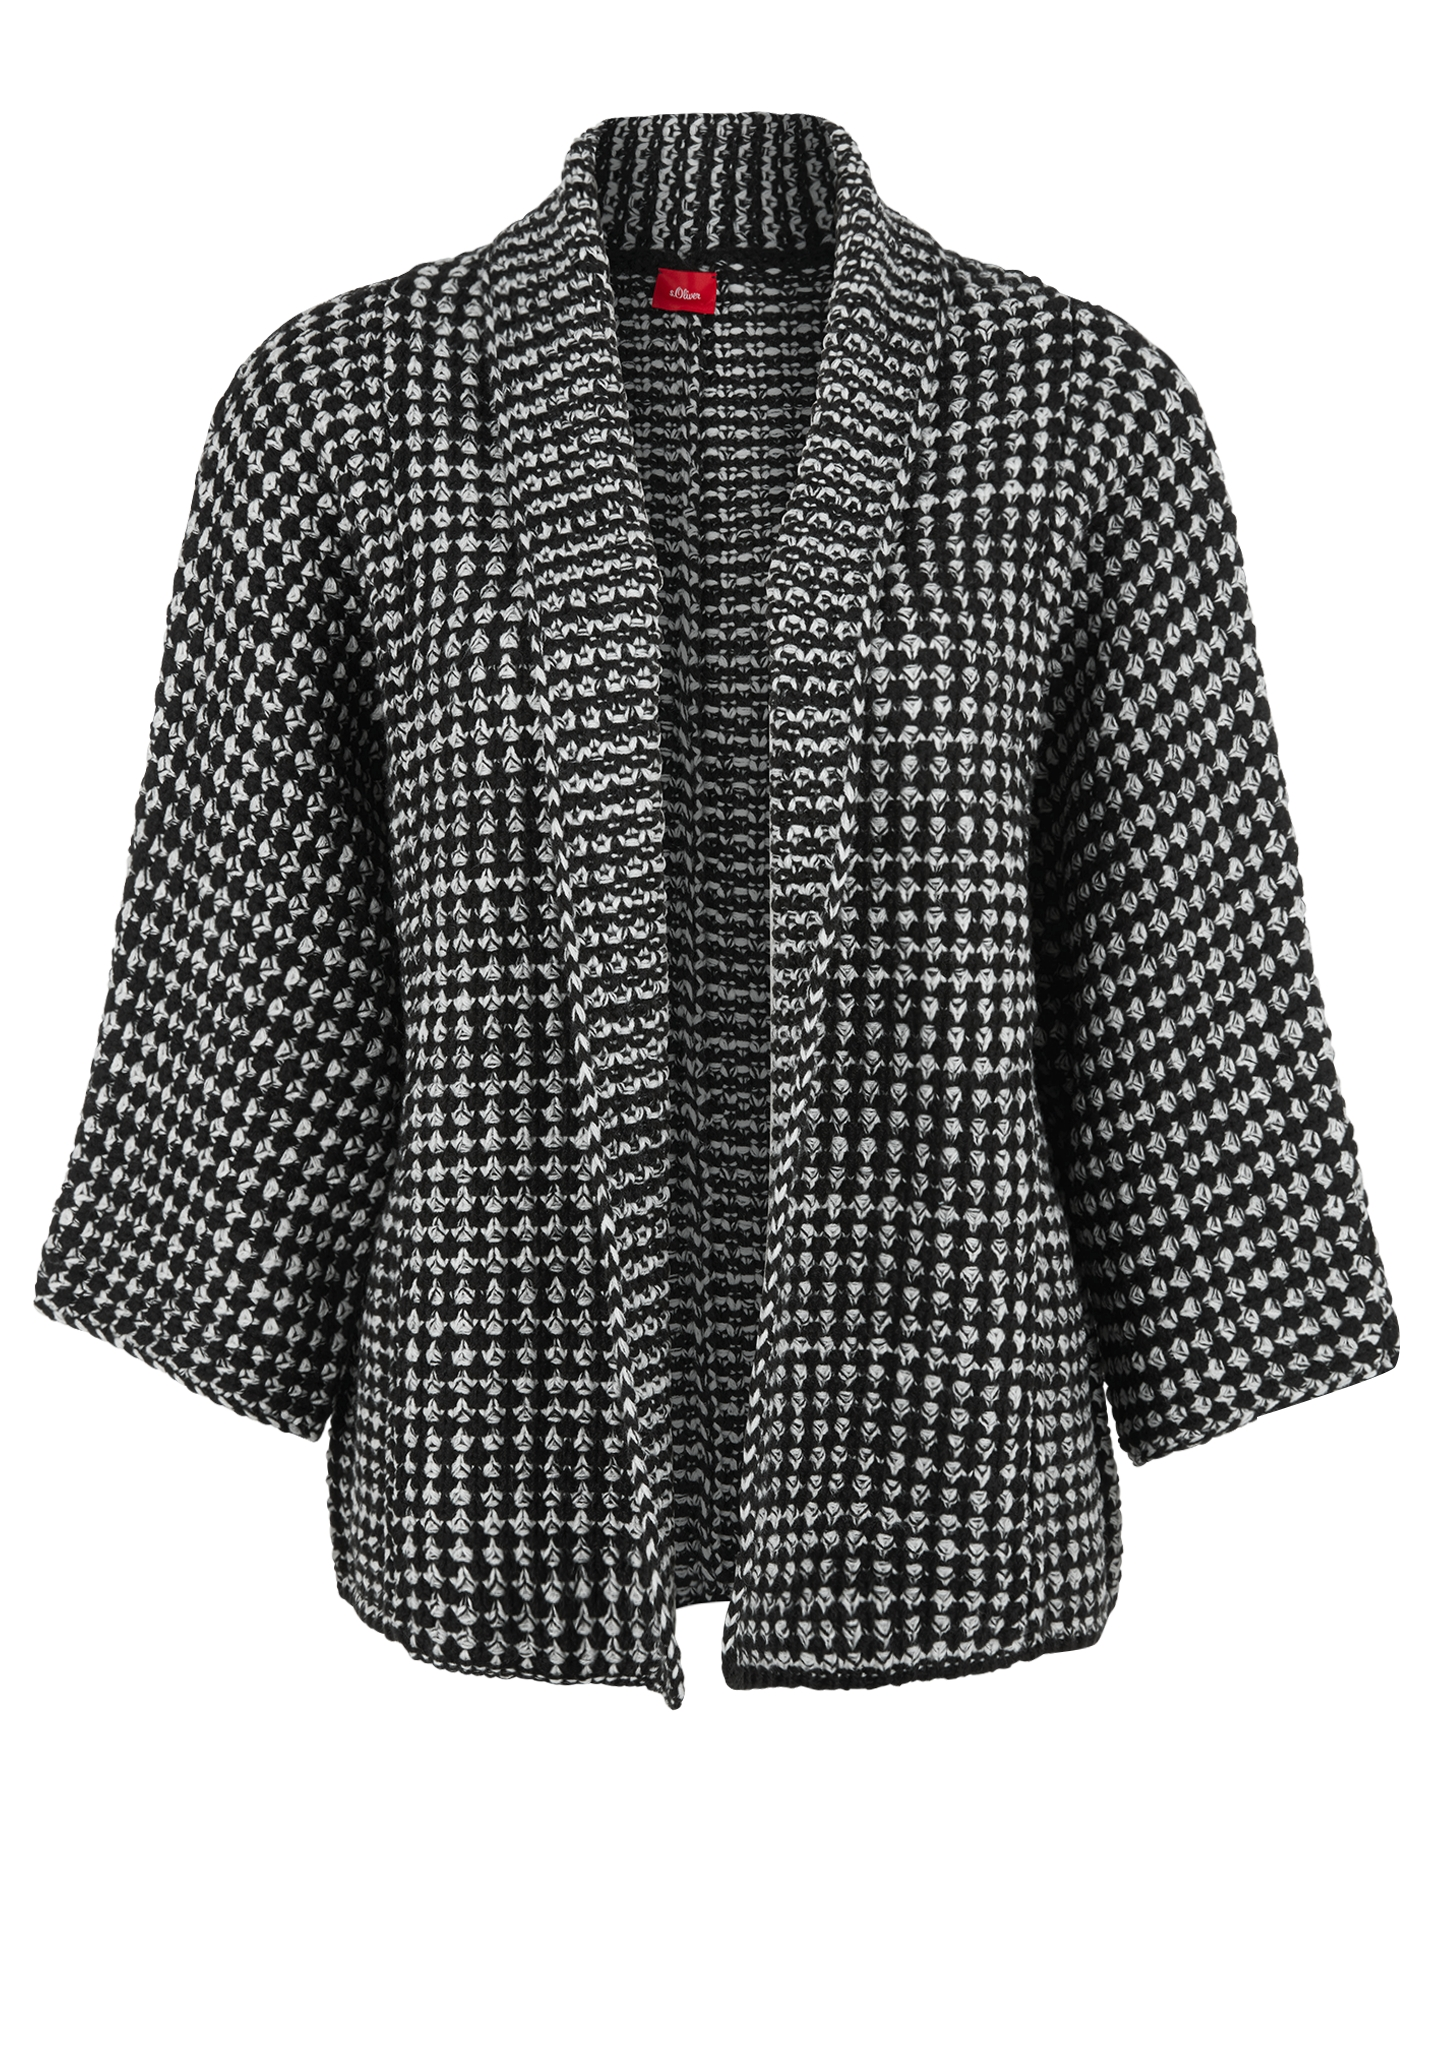 Poncho | Bekleidung > Pullover > Ponchos & Capes | Grau/schwarz | 100% polyacryl | s.Oliver